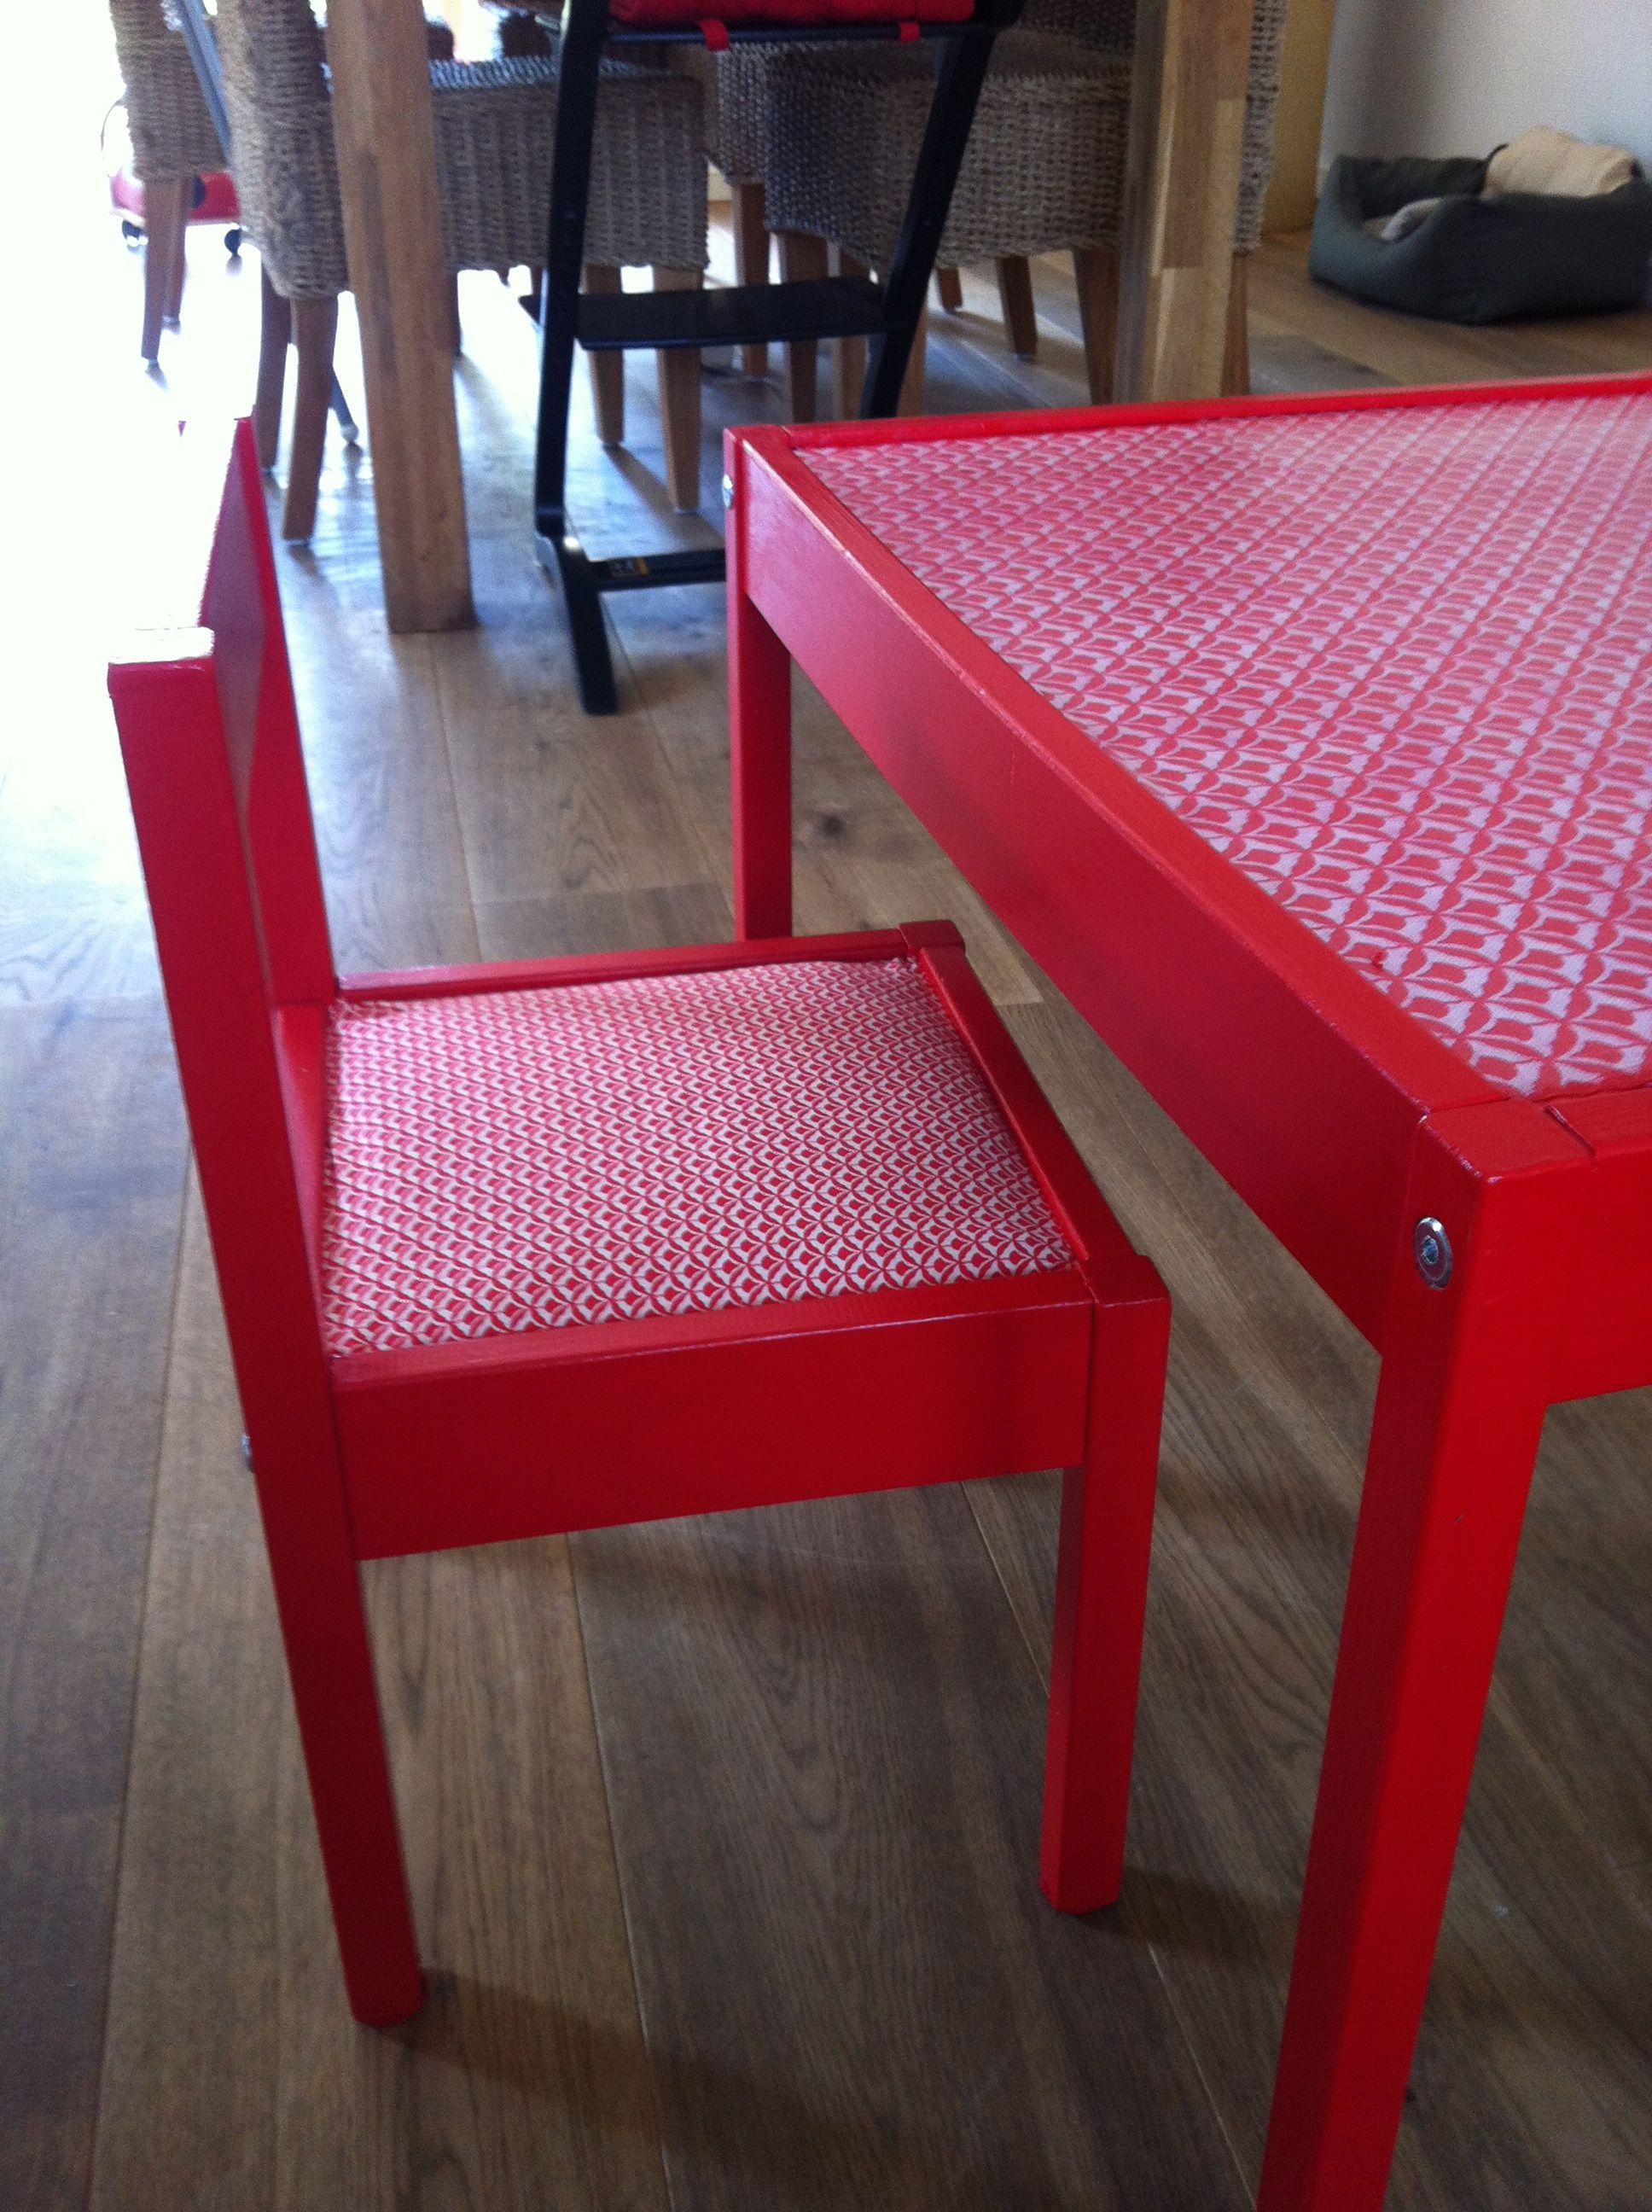 ikea tafeltje en stoel pimpen zelfgemaakt pinterest. Black Bedroom Furniture Sets. Home Design Ideas